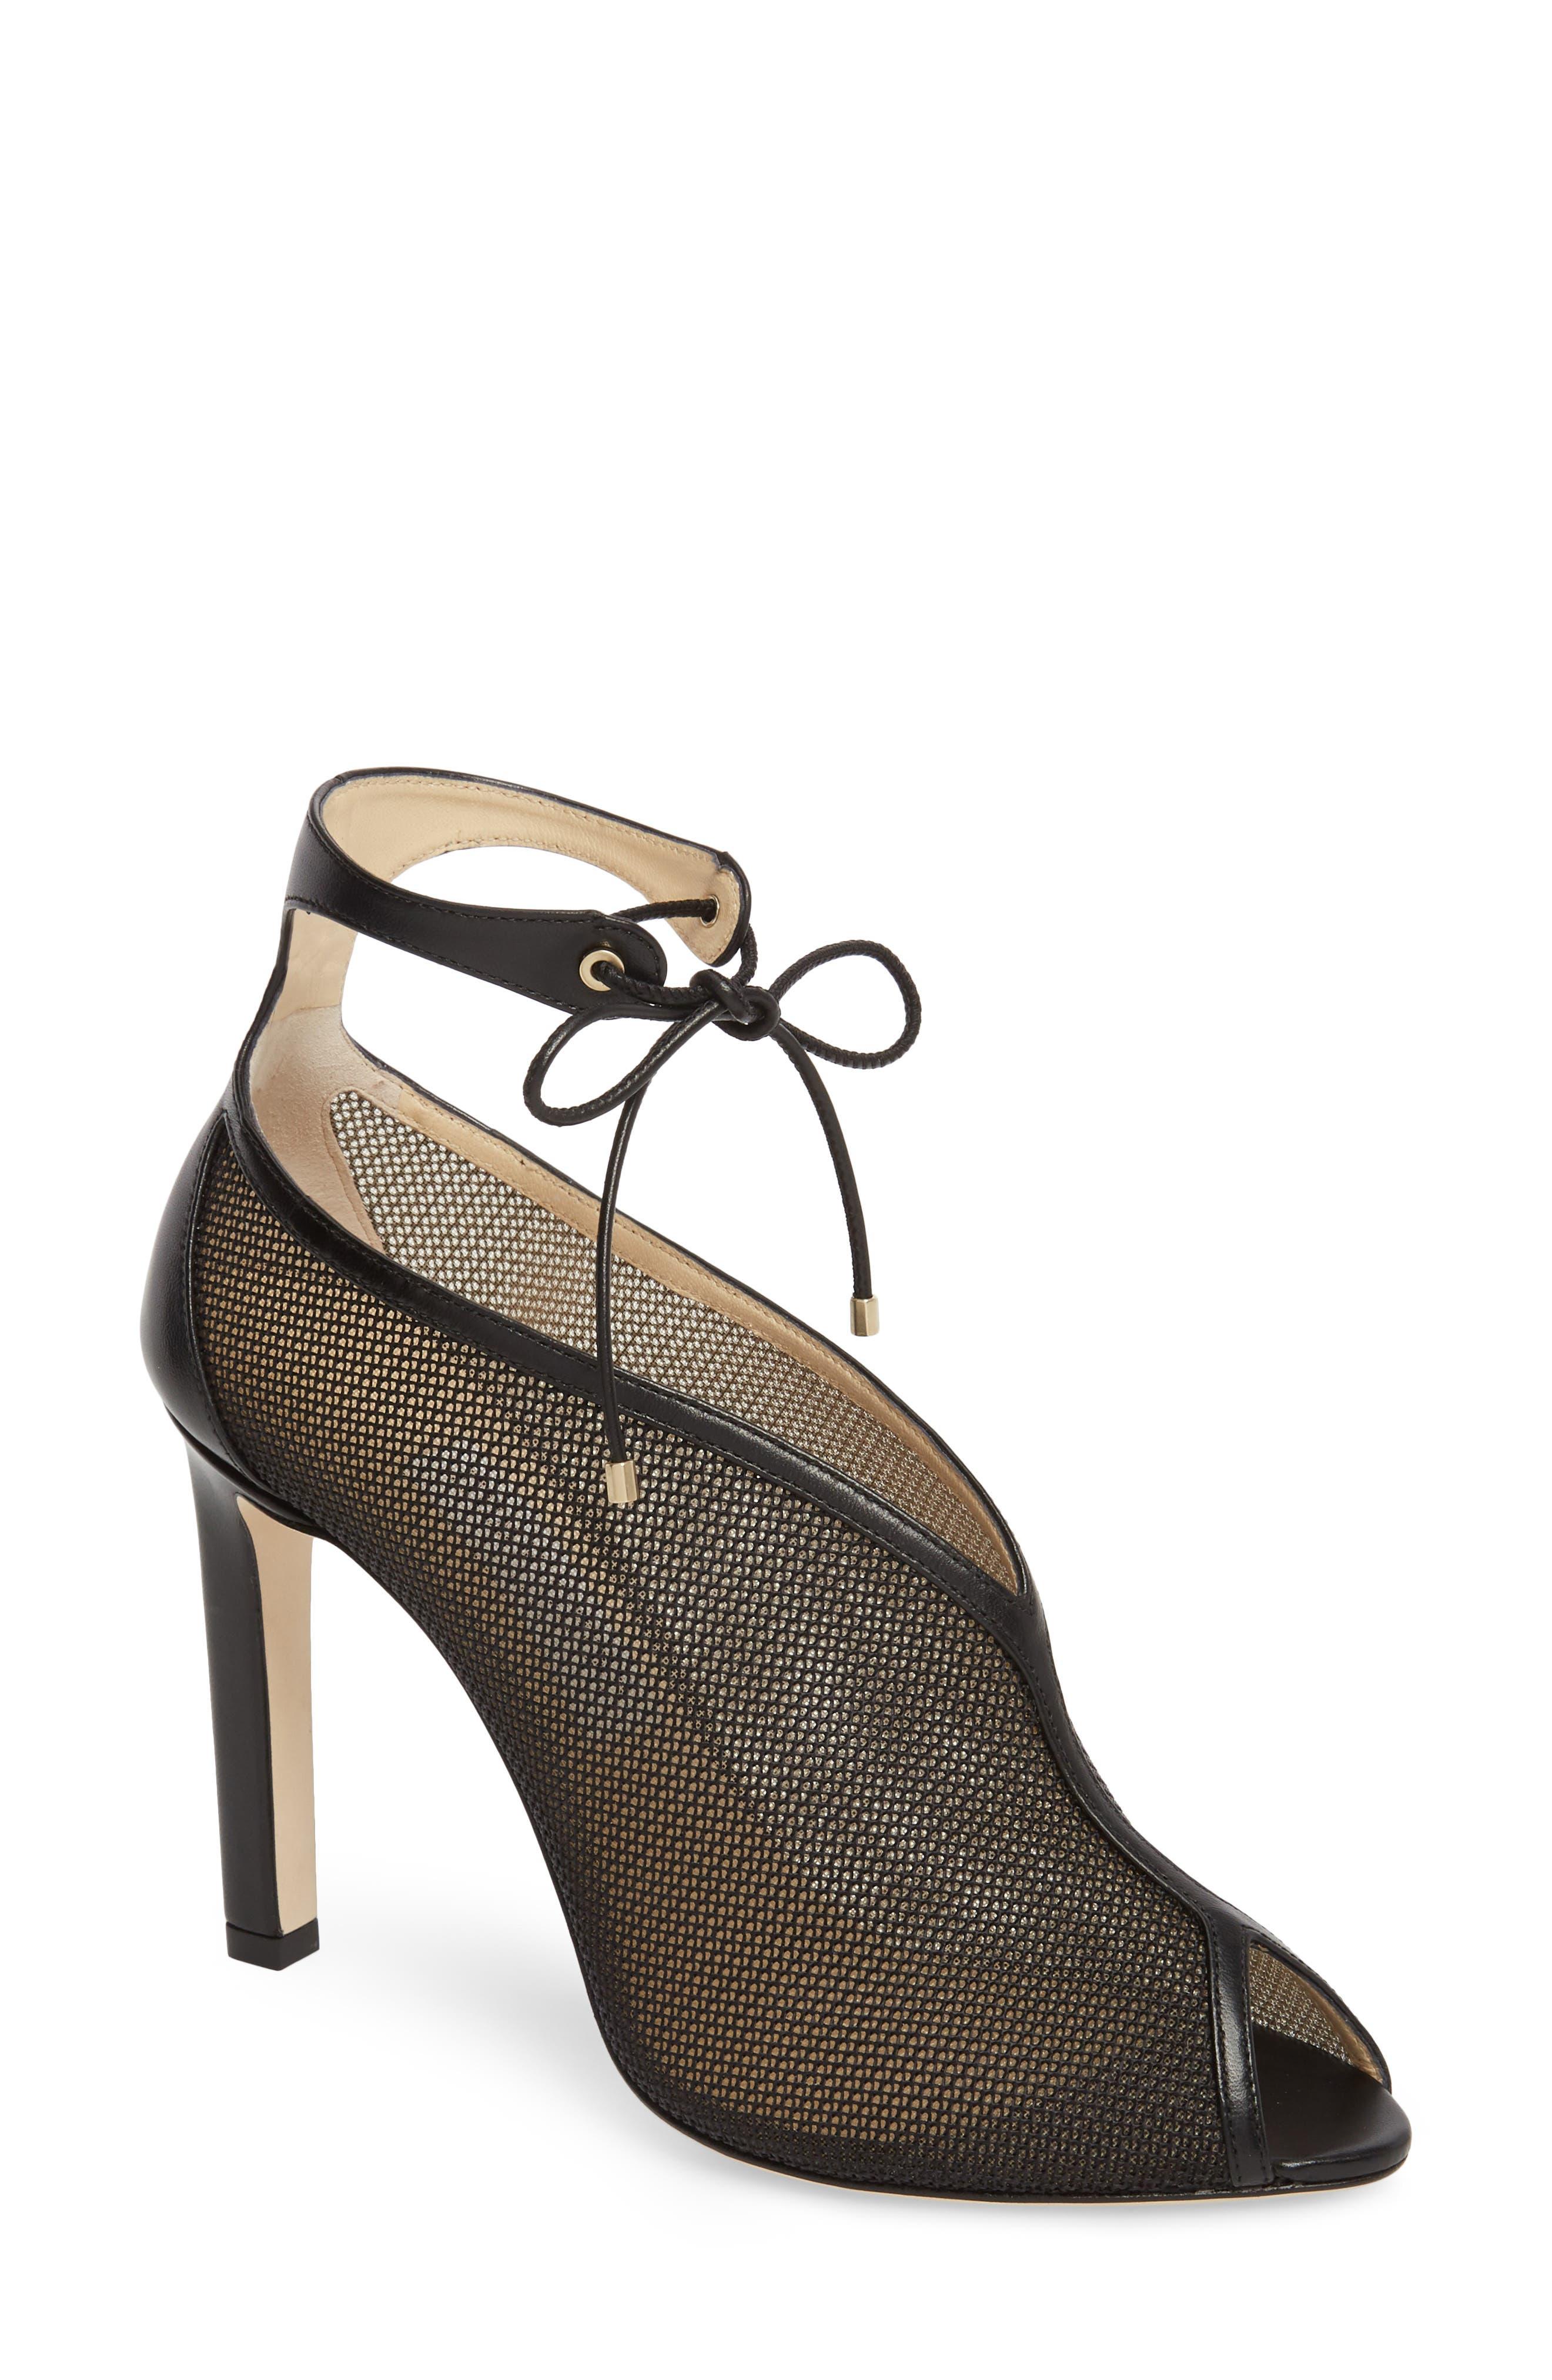 Sayra Ankle Tie Bootie,                         Main,                         color, BLACK